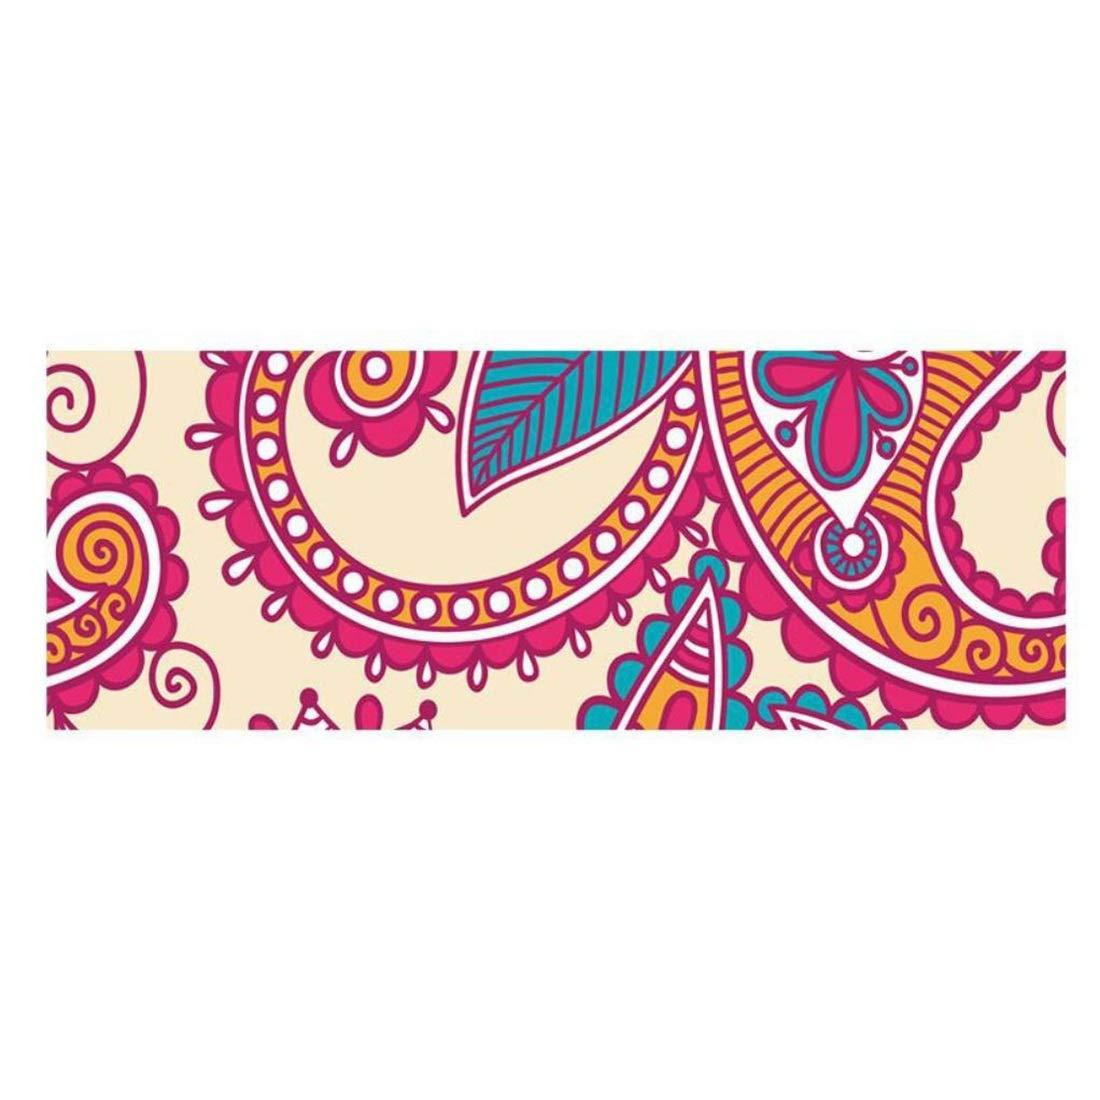 Koloeplf ピラティス/エクササイズ/体操マットワイドノンスリップ折りたたみラバーフィットネスマット (Color : H) B07M8F3QYG B B